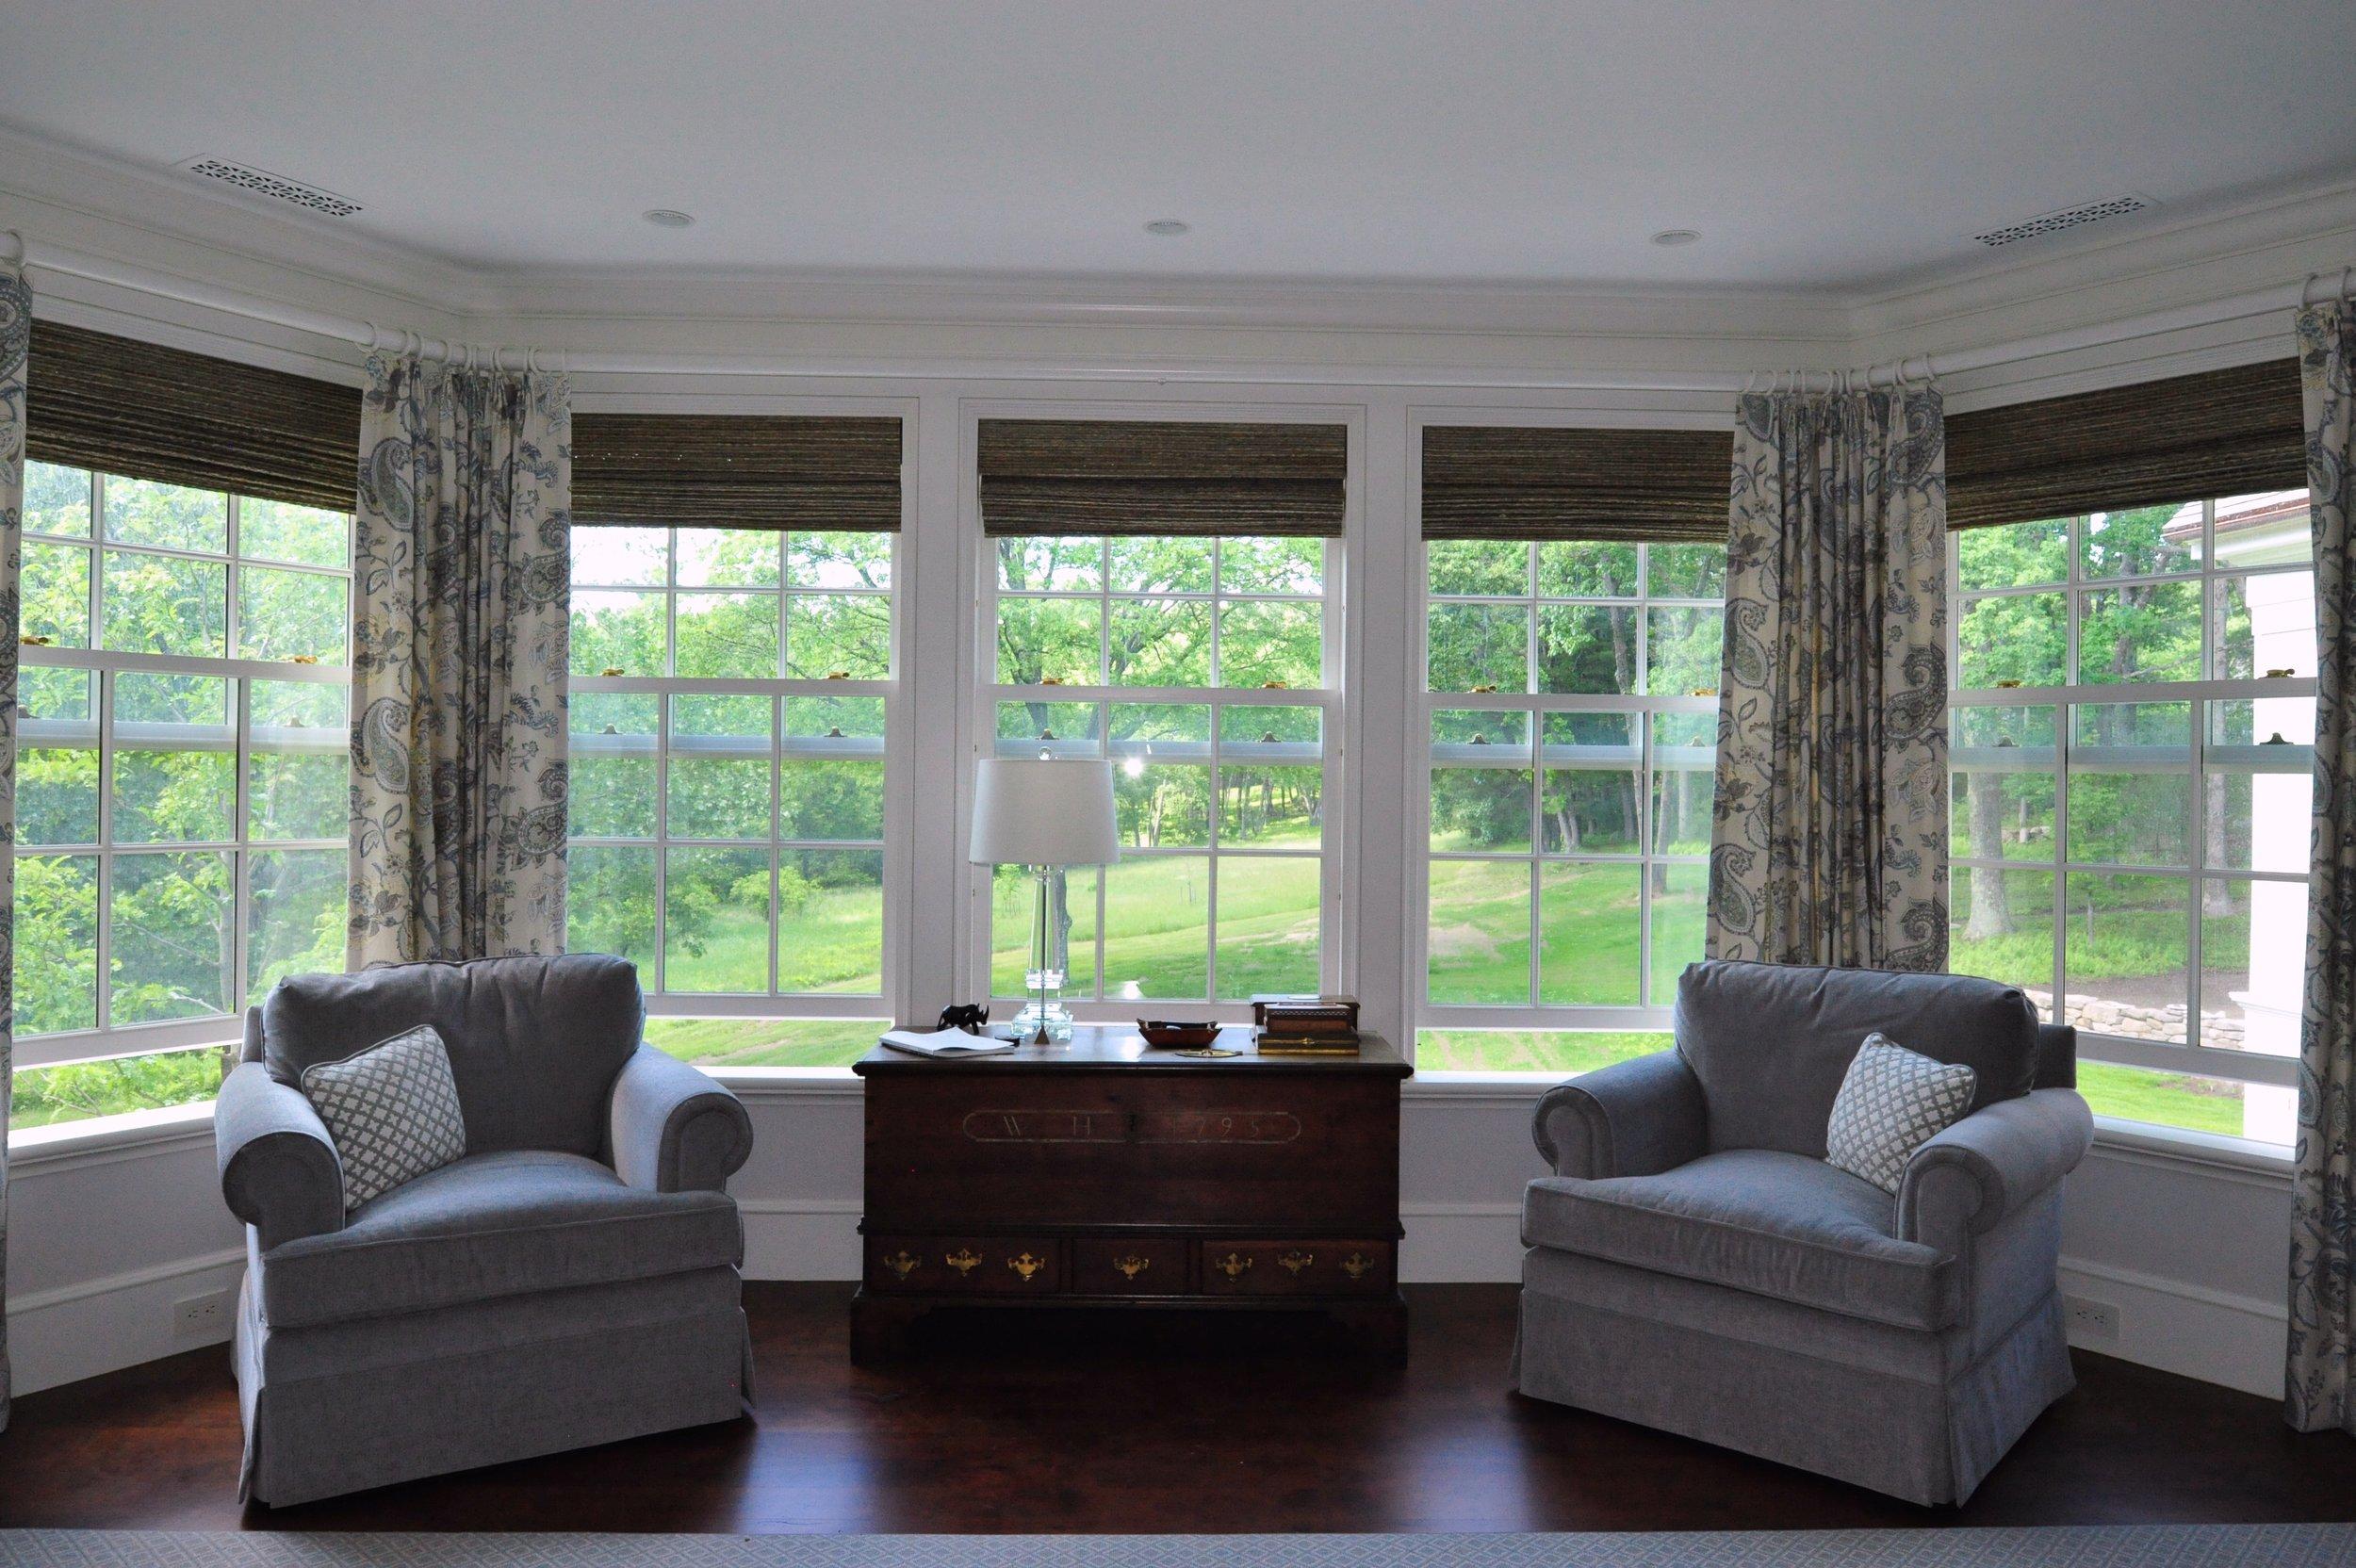 Sitting Room Window Interior.jpg